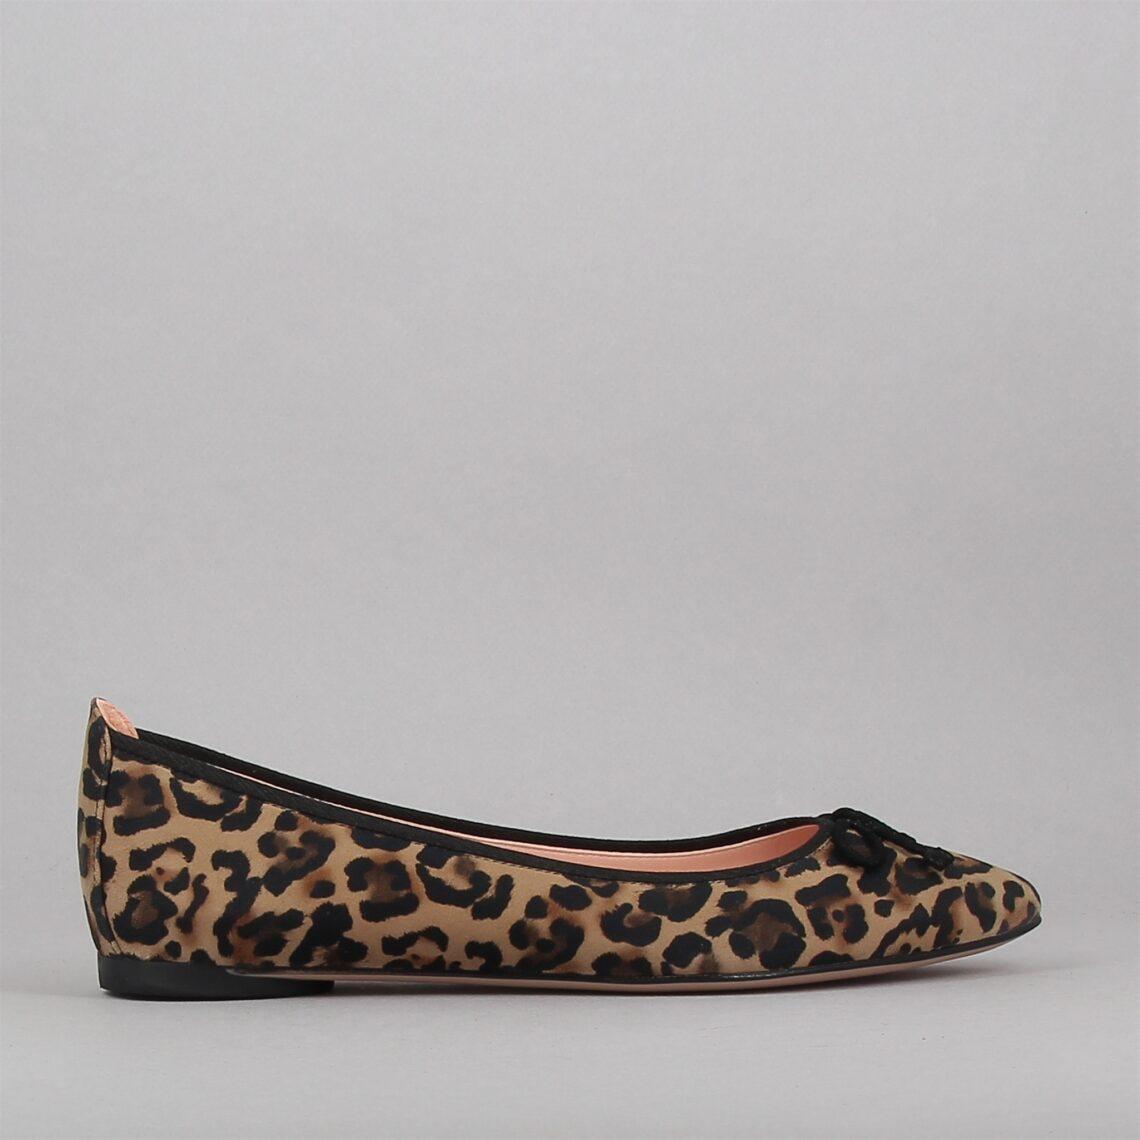 areny-leopard-176062466-0.jpg